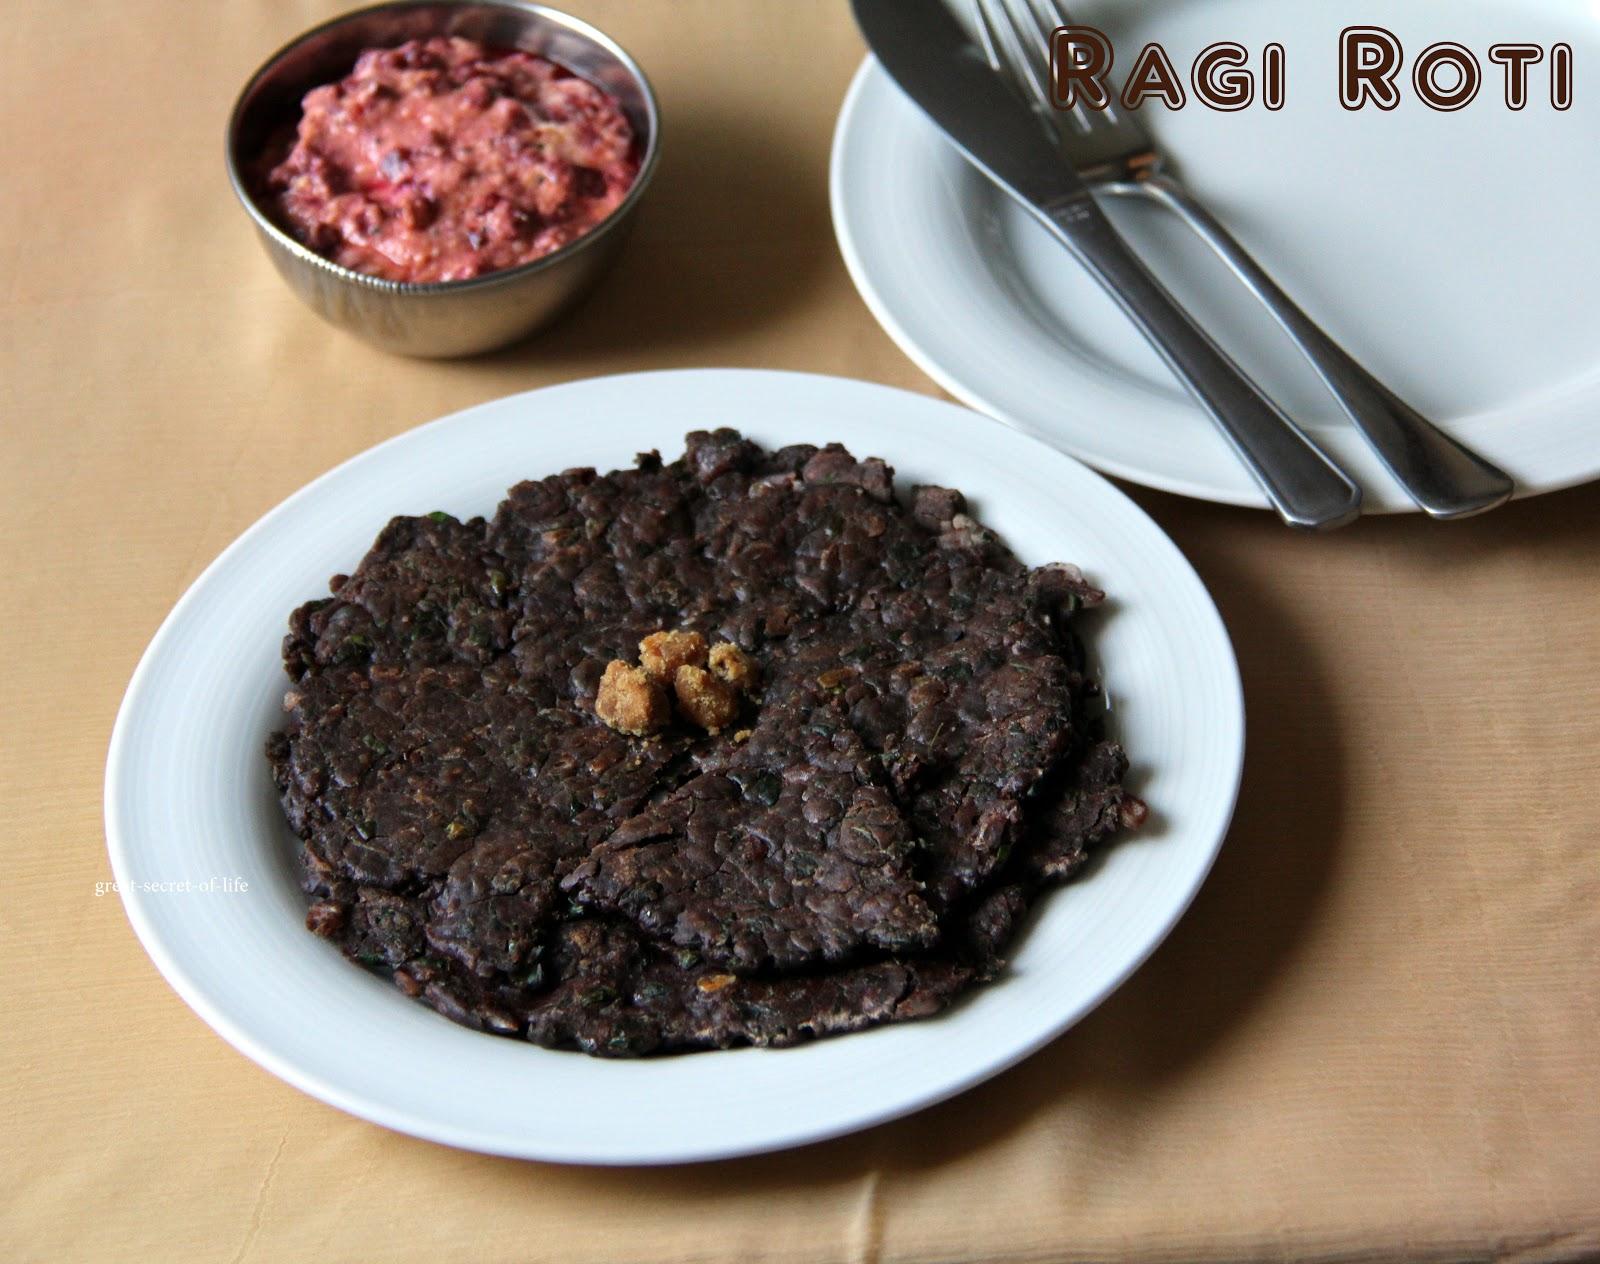 Drumstick Leaves Ragi Roti - Great Secret Of Life - Tasty Recipes